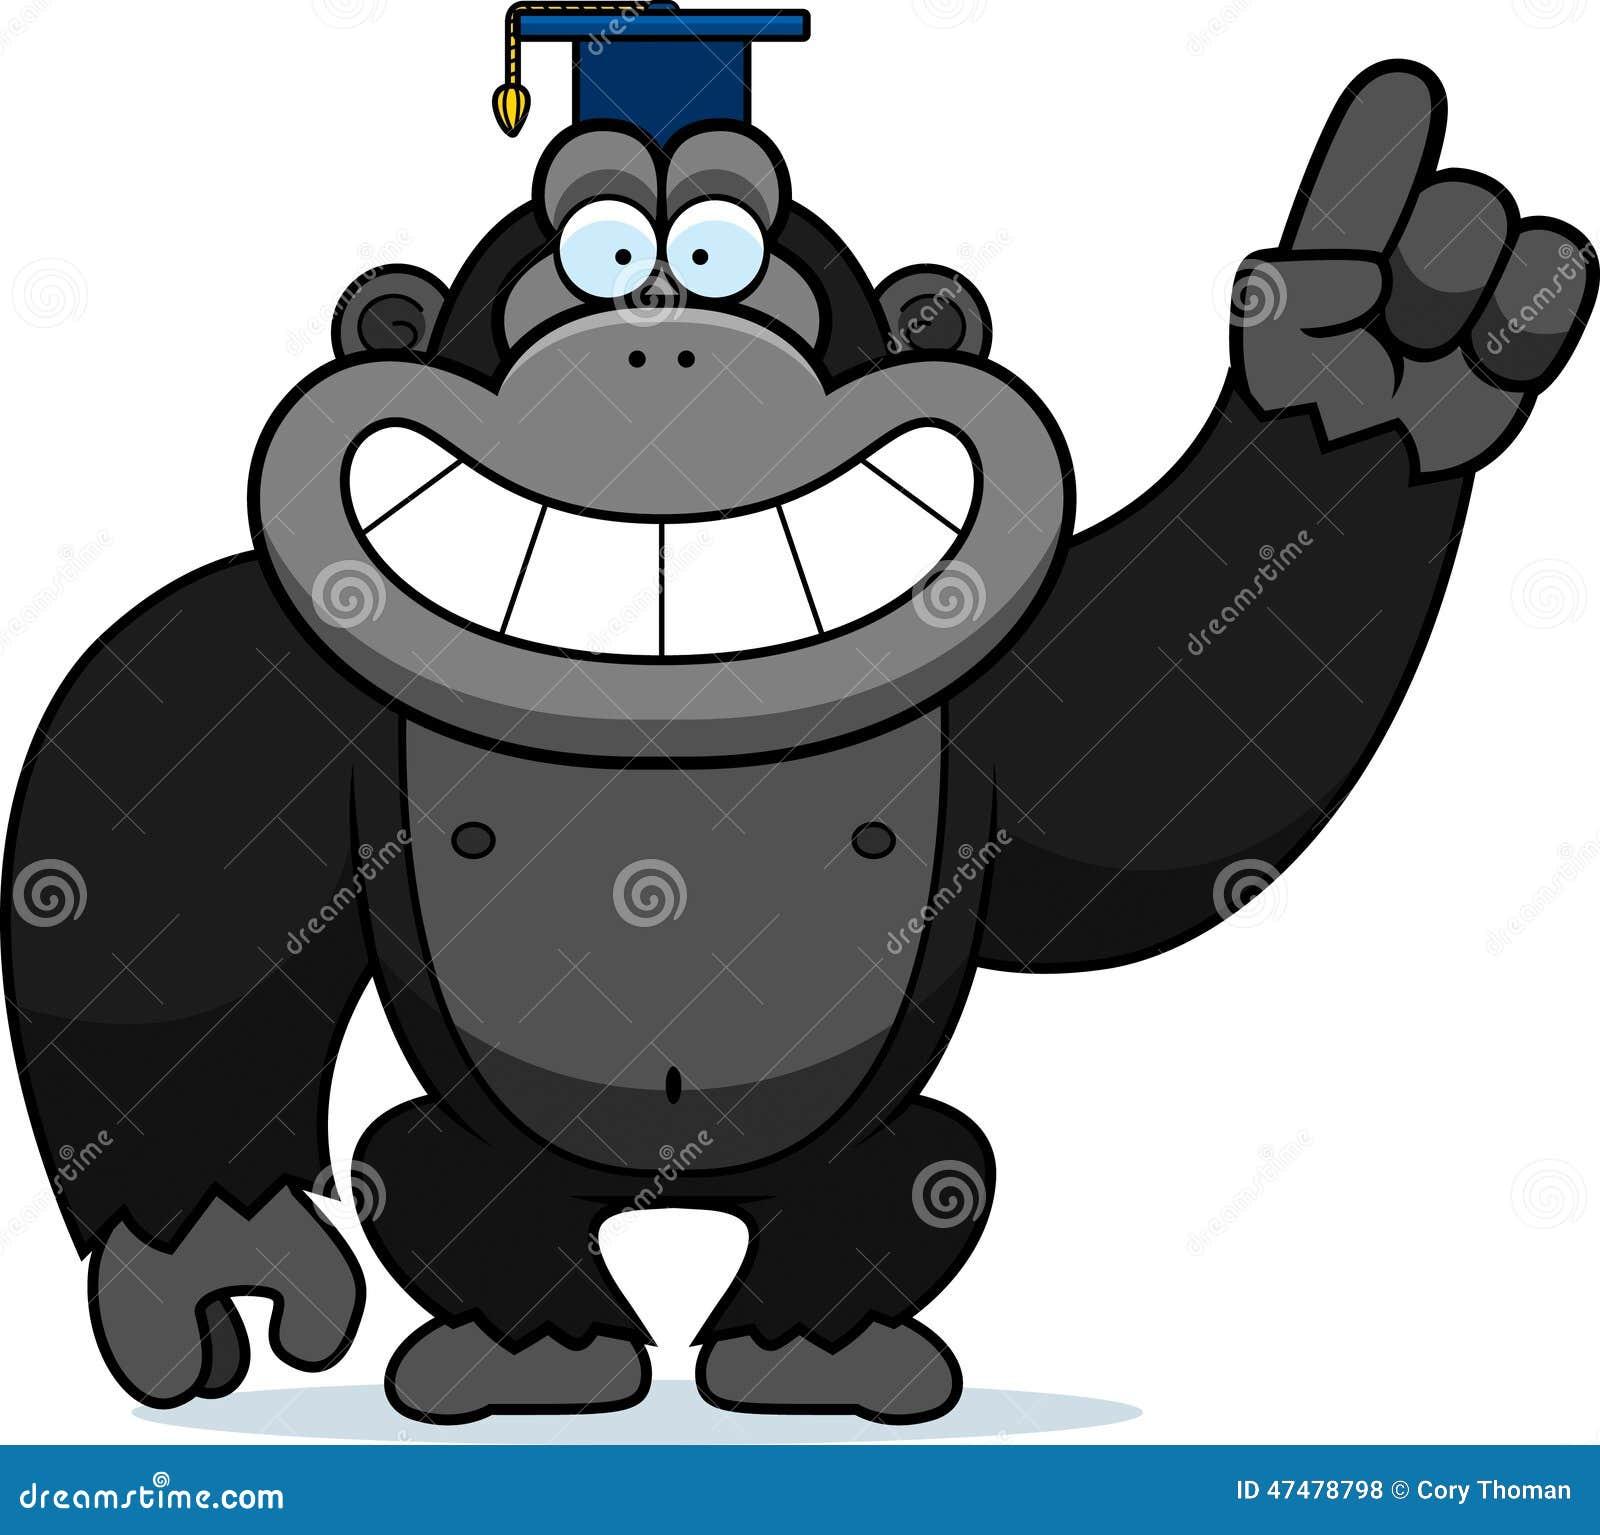 Cartoon Gorilla Professor Stock Vector - Image: 47478798